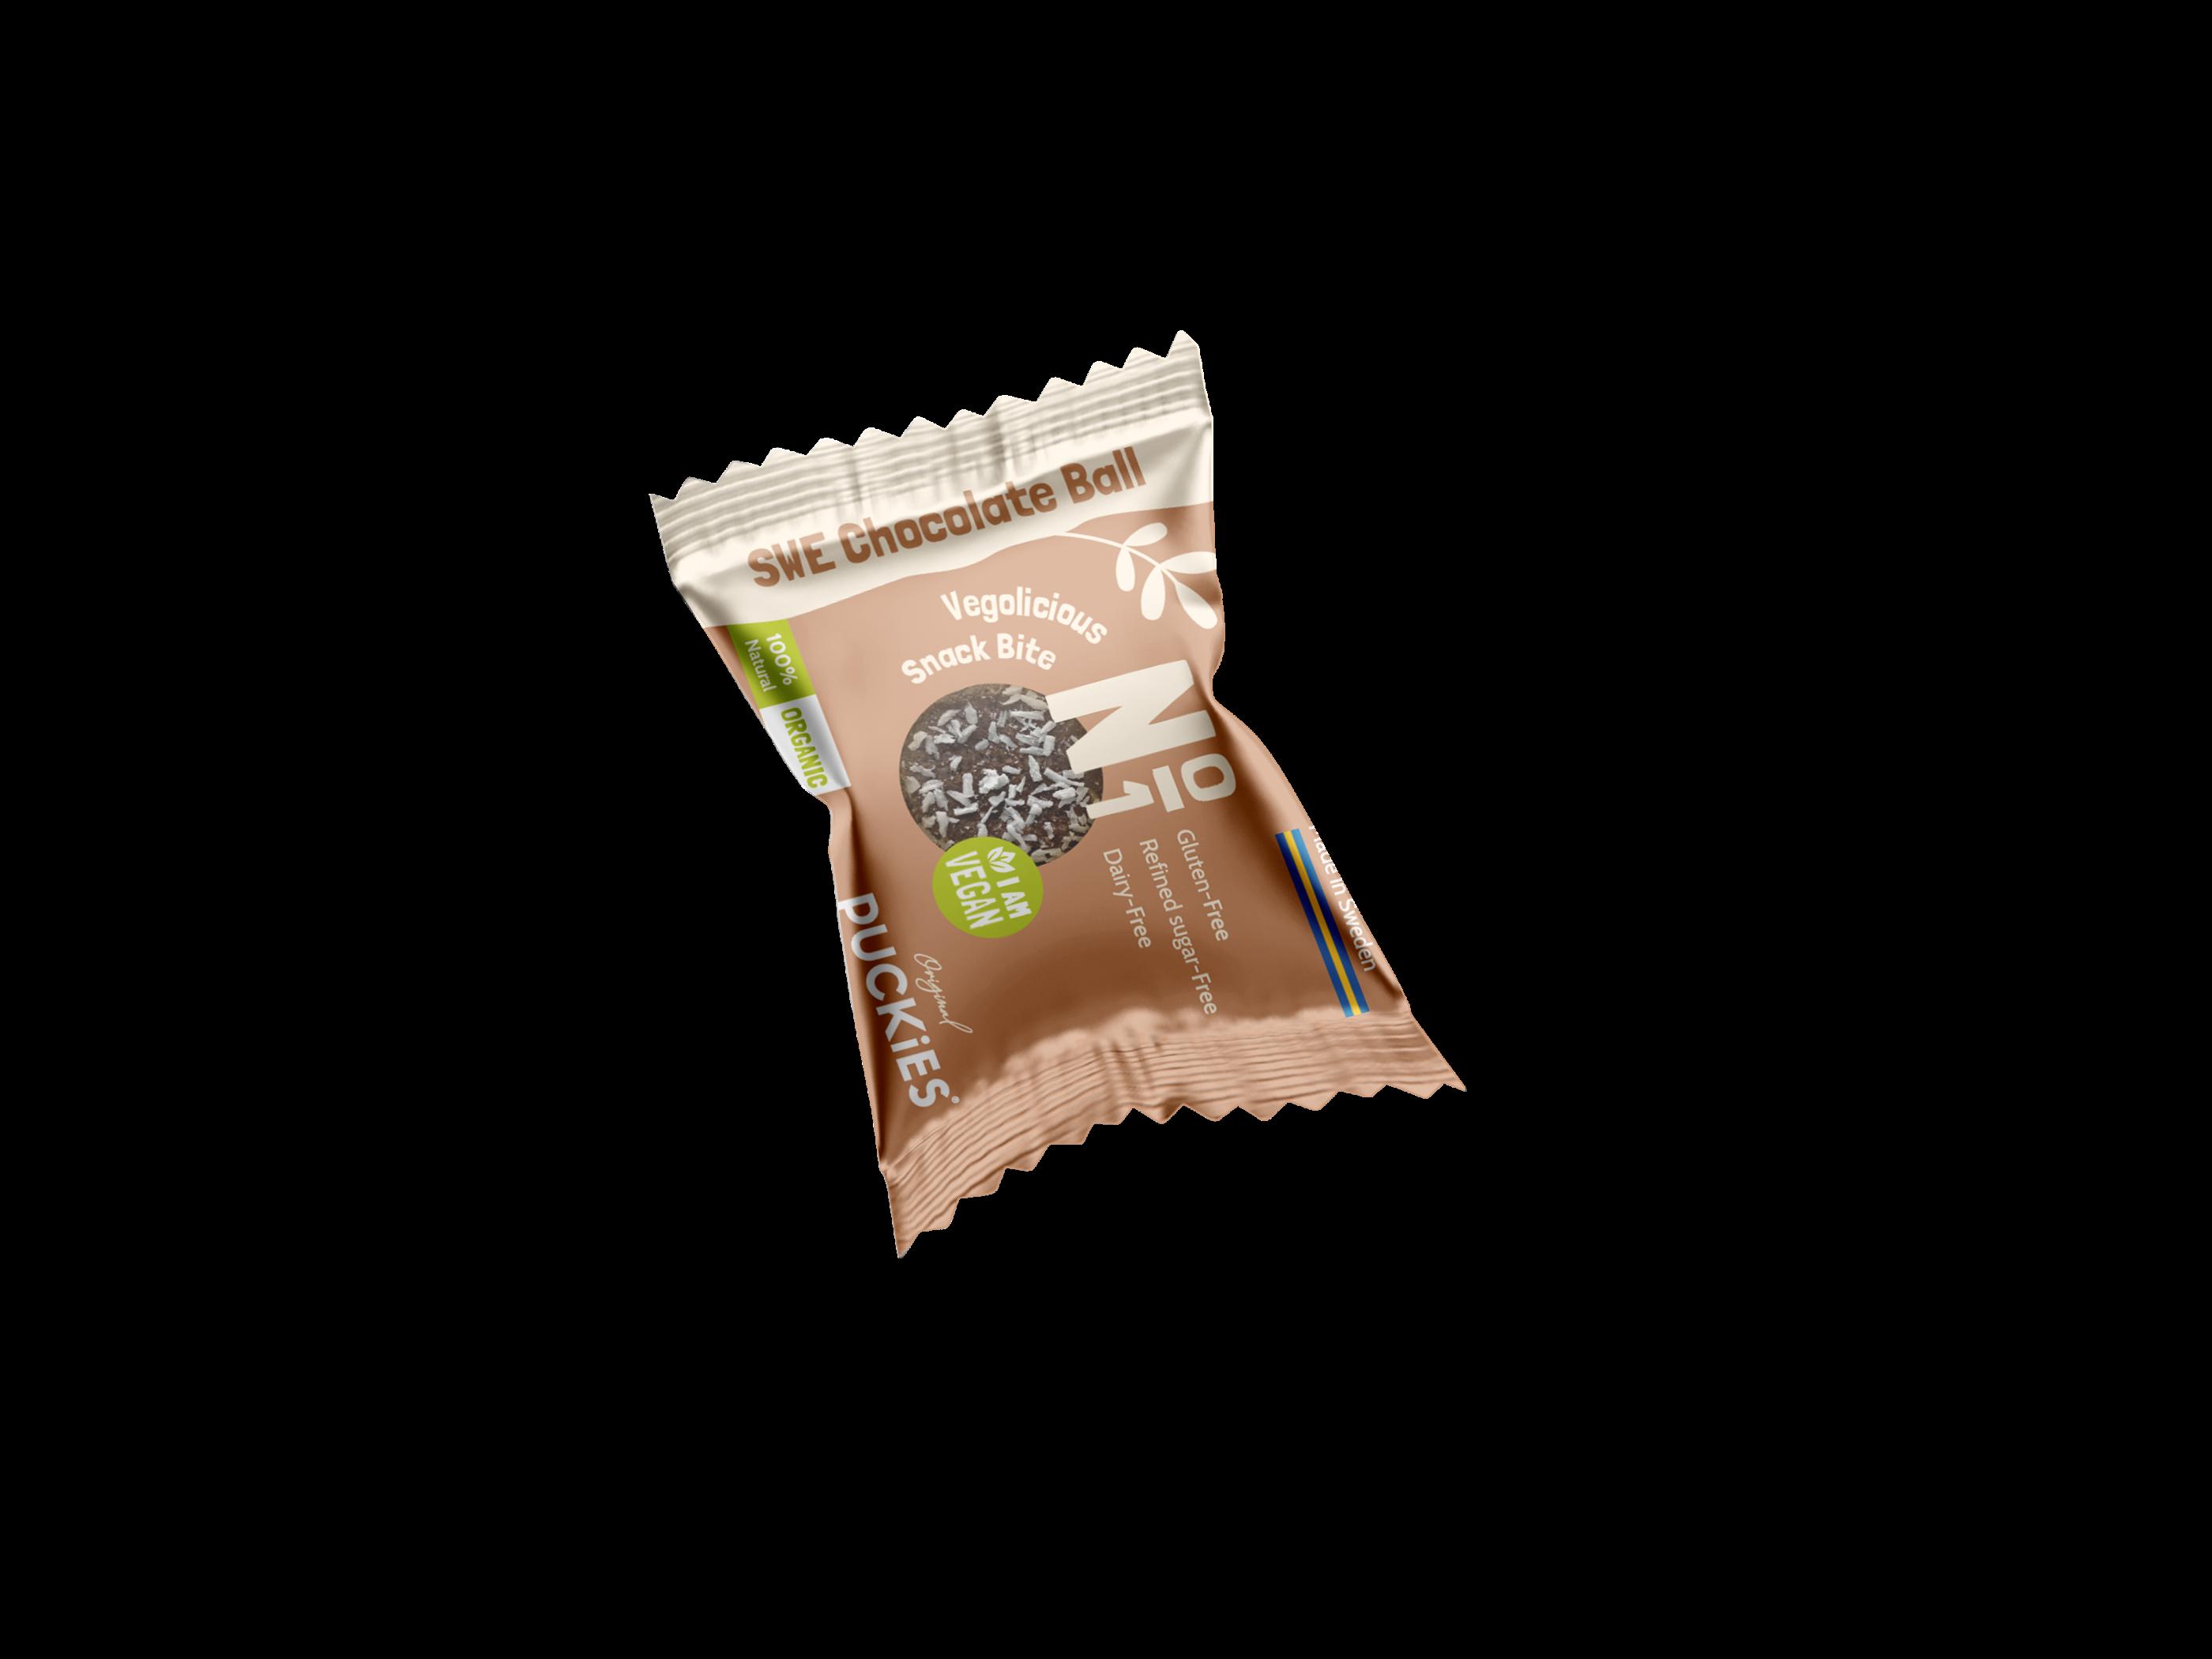 Swe chocolate ball